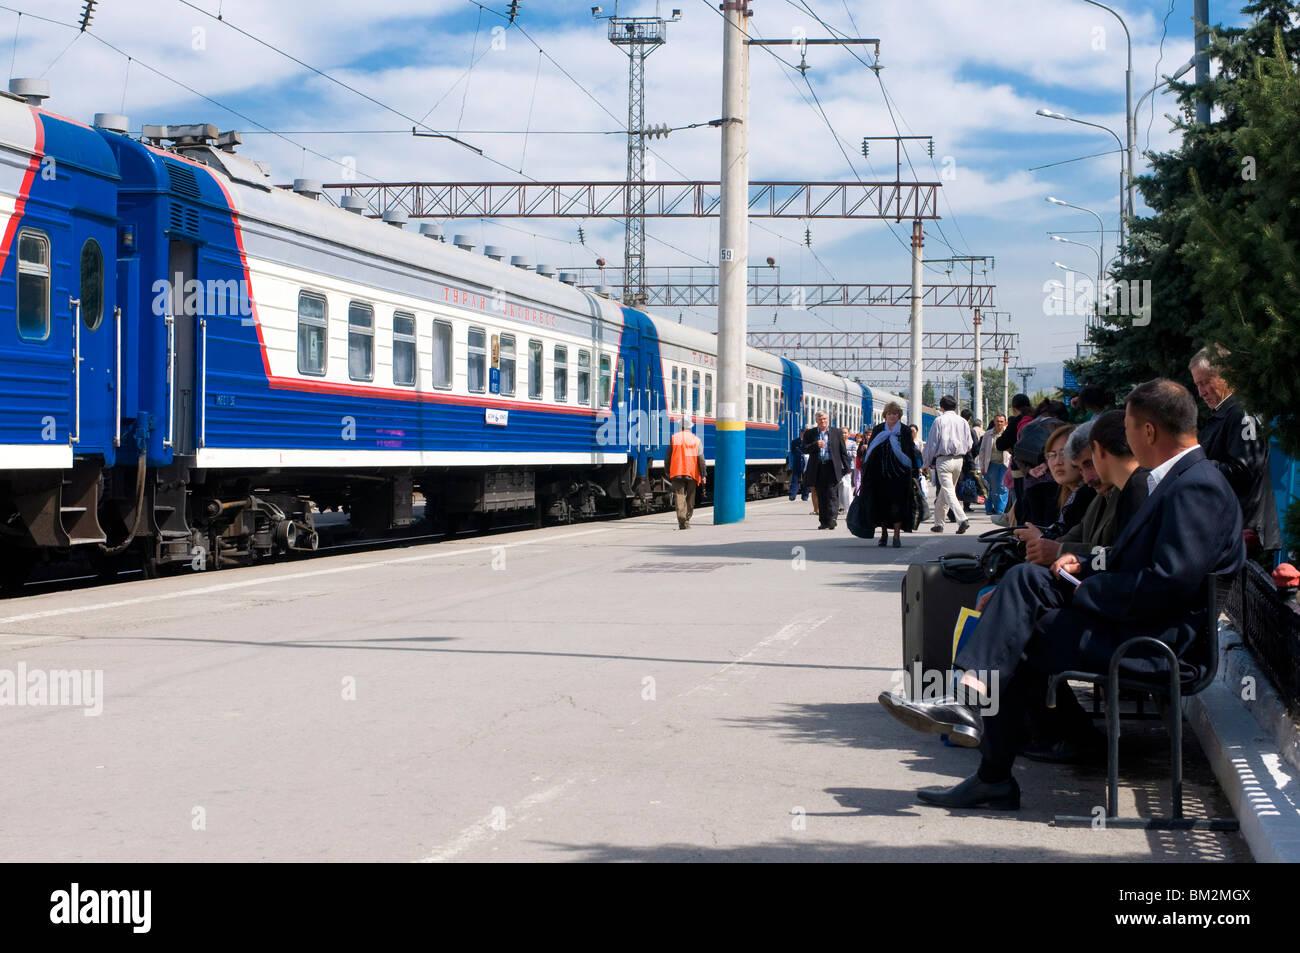 Railway station with passengers and train, Almaty, Kazakhstan - Stock Image